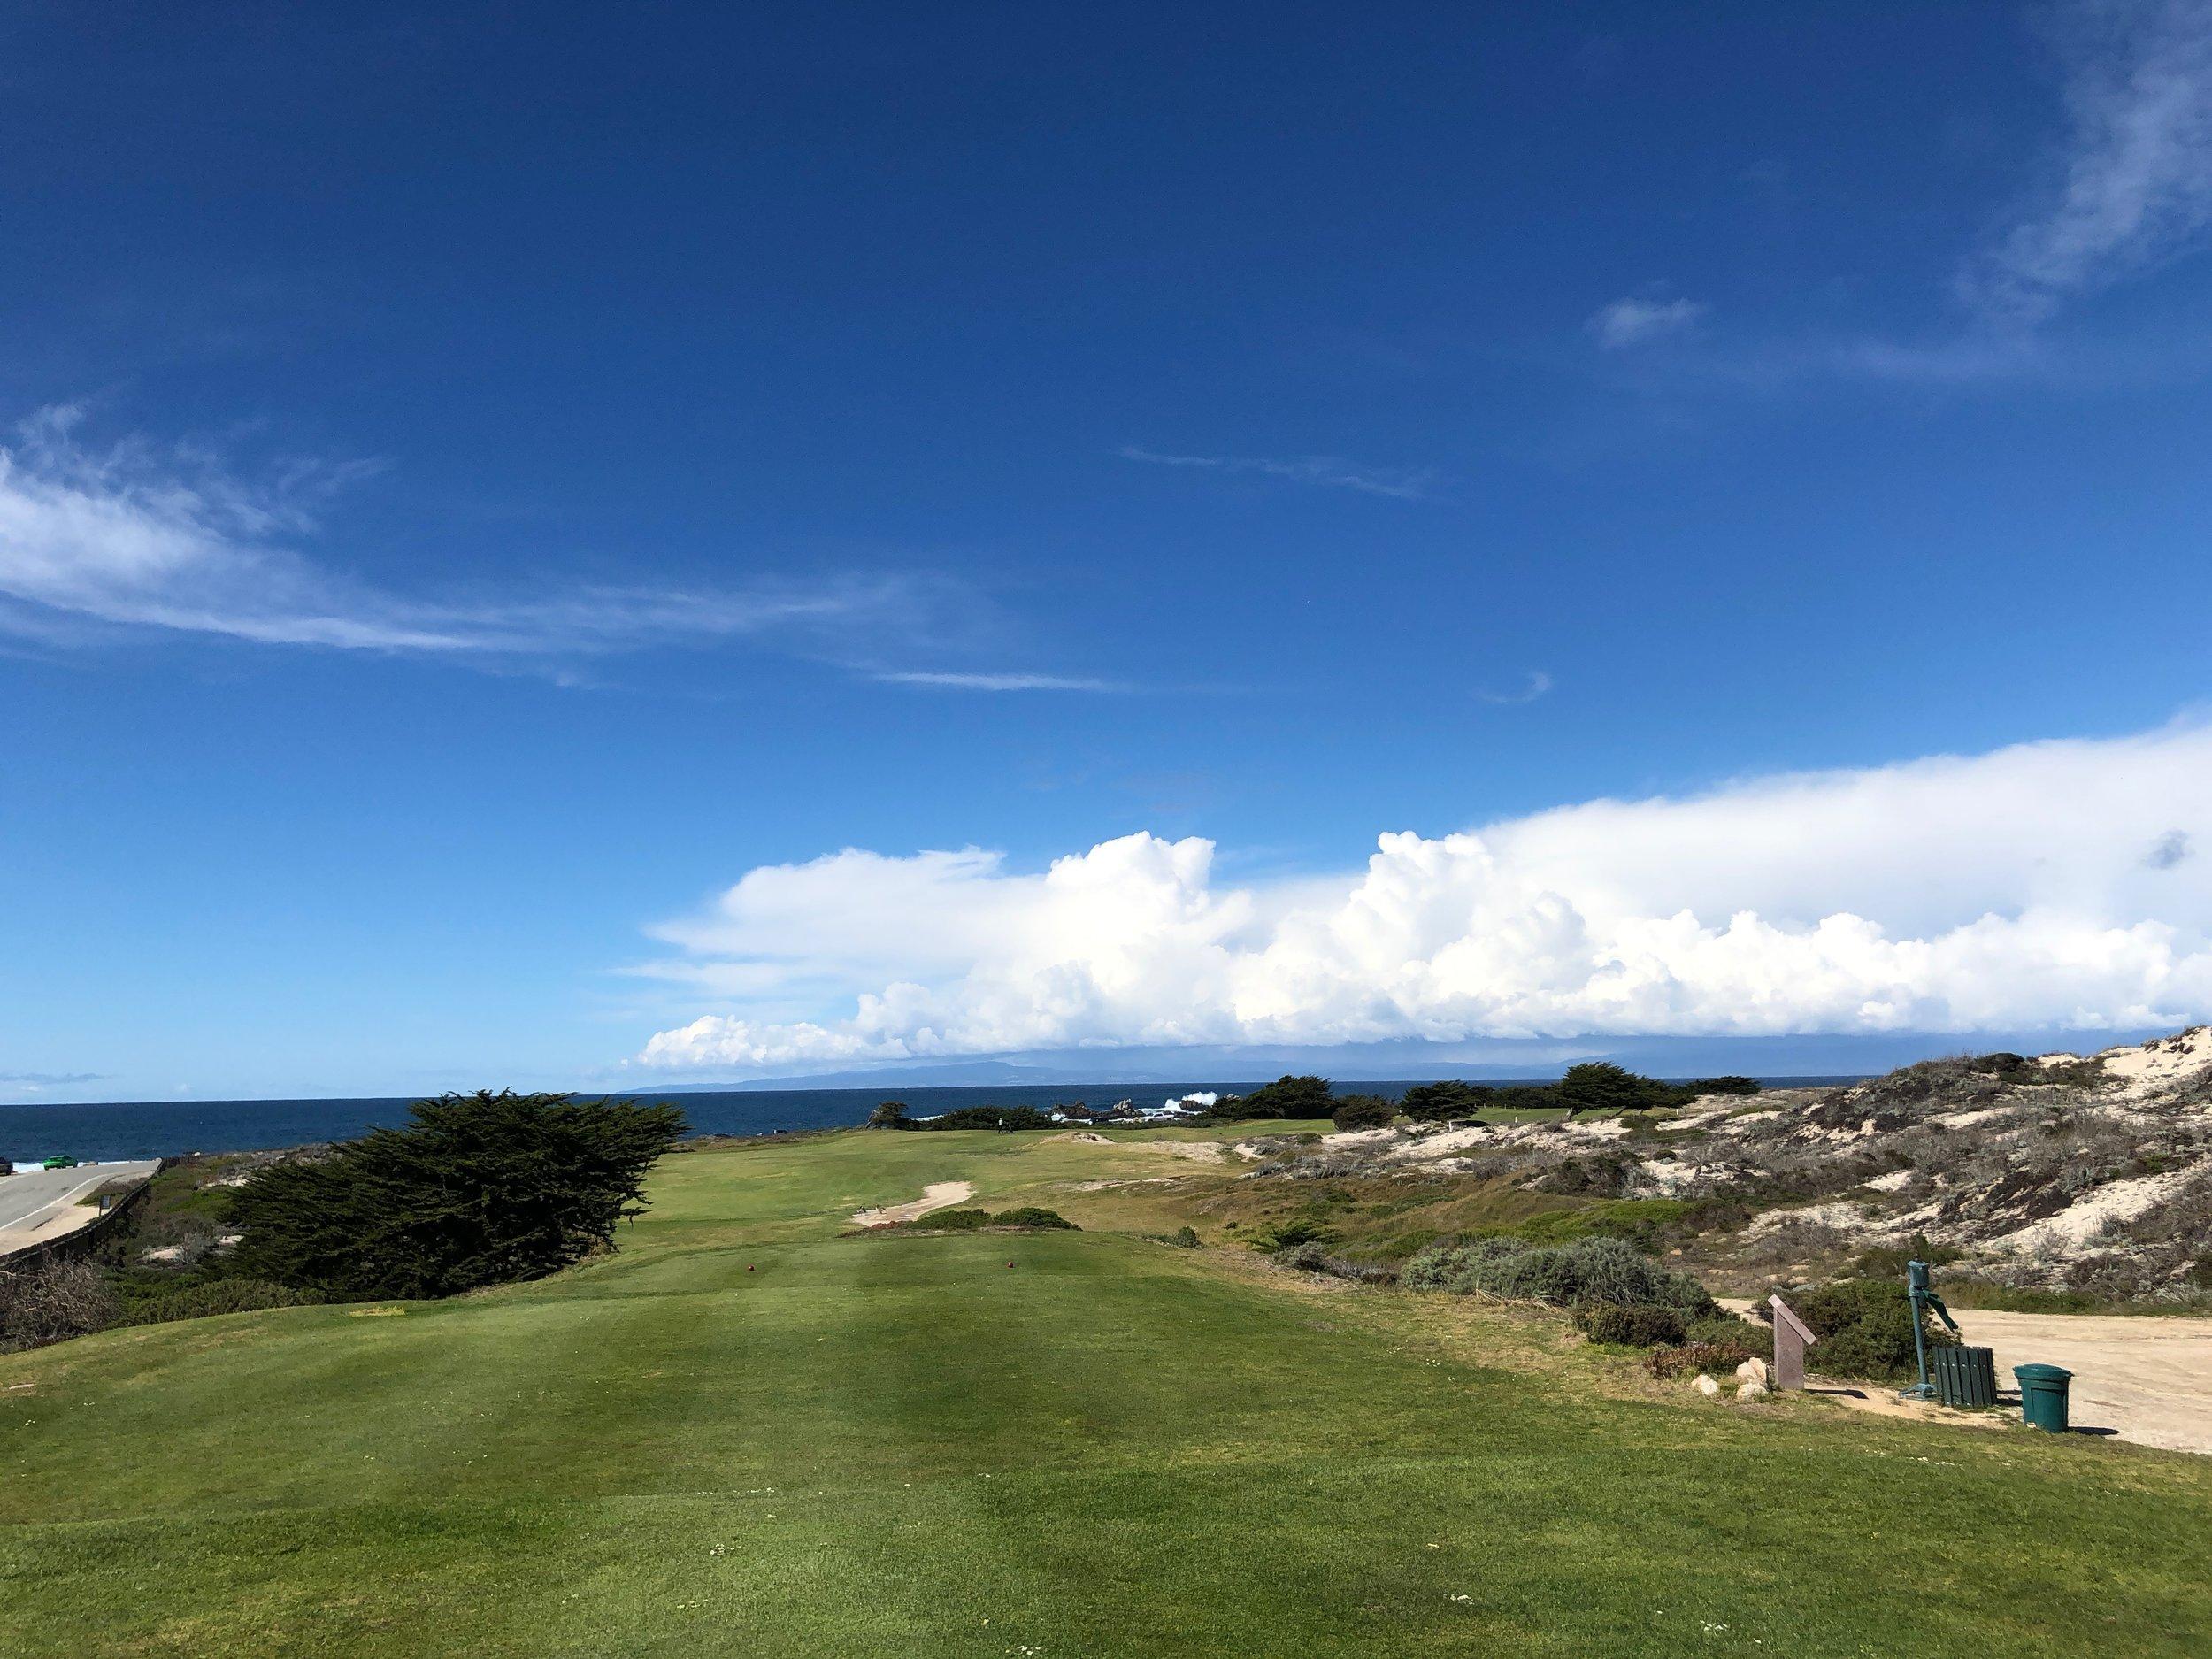 California's Golf Coast